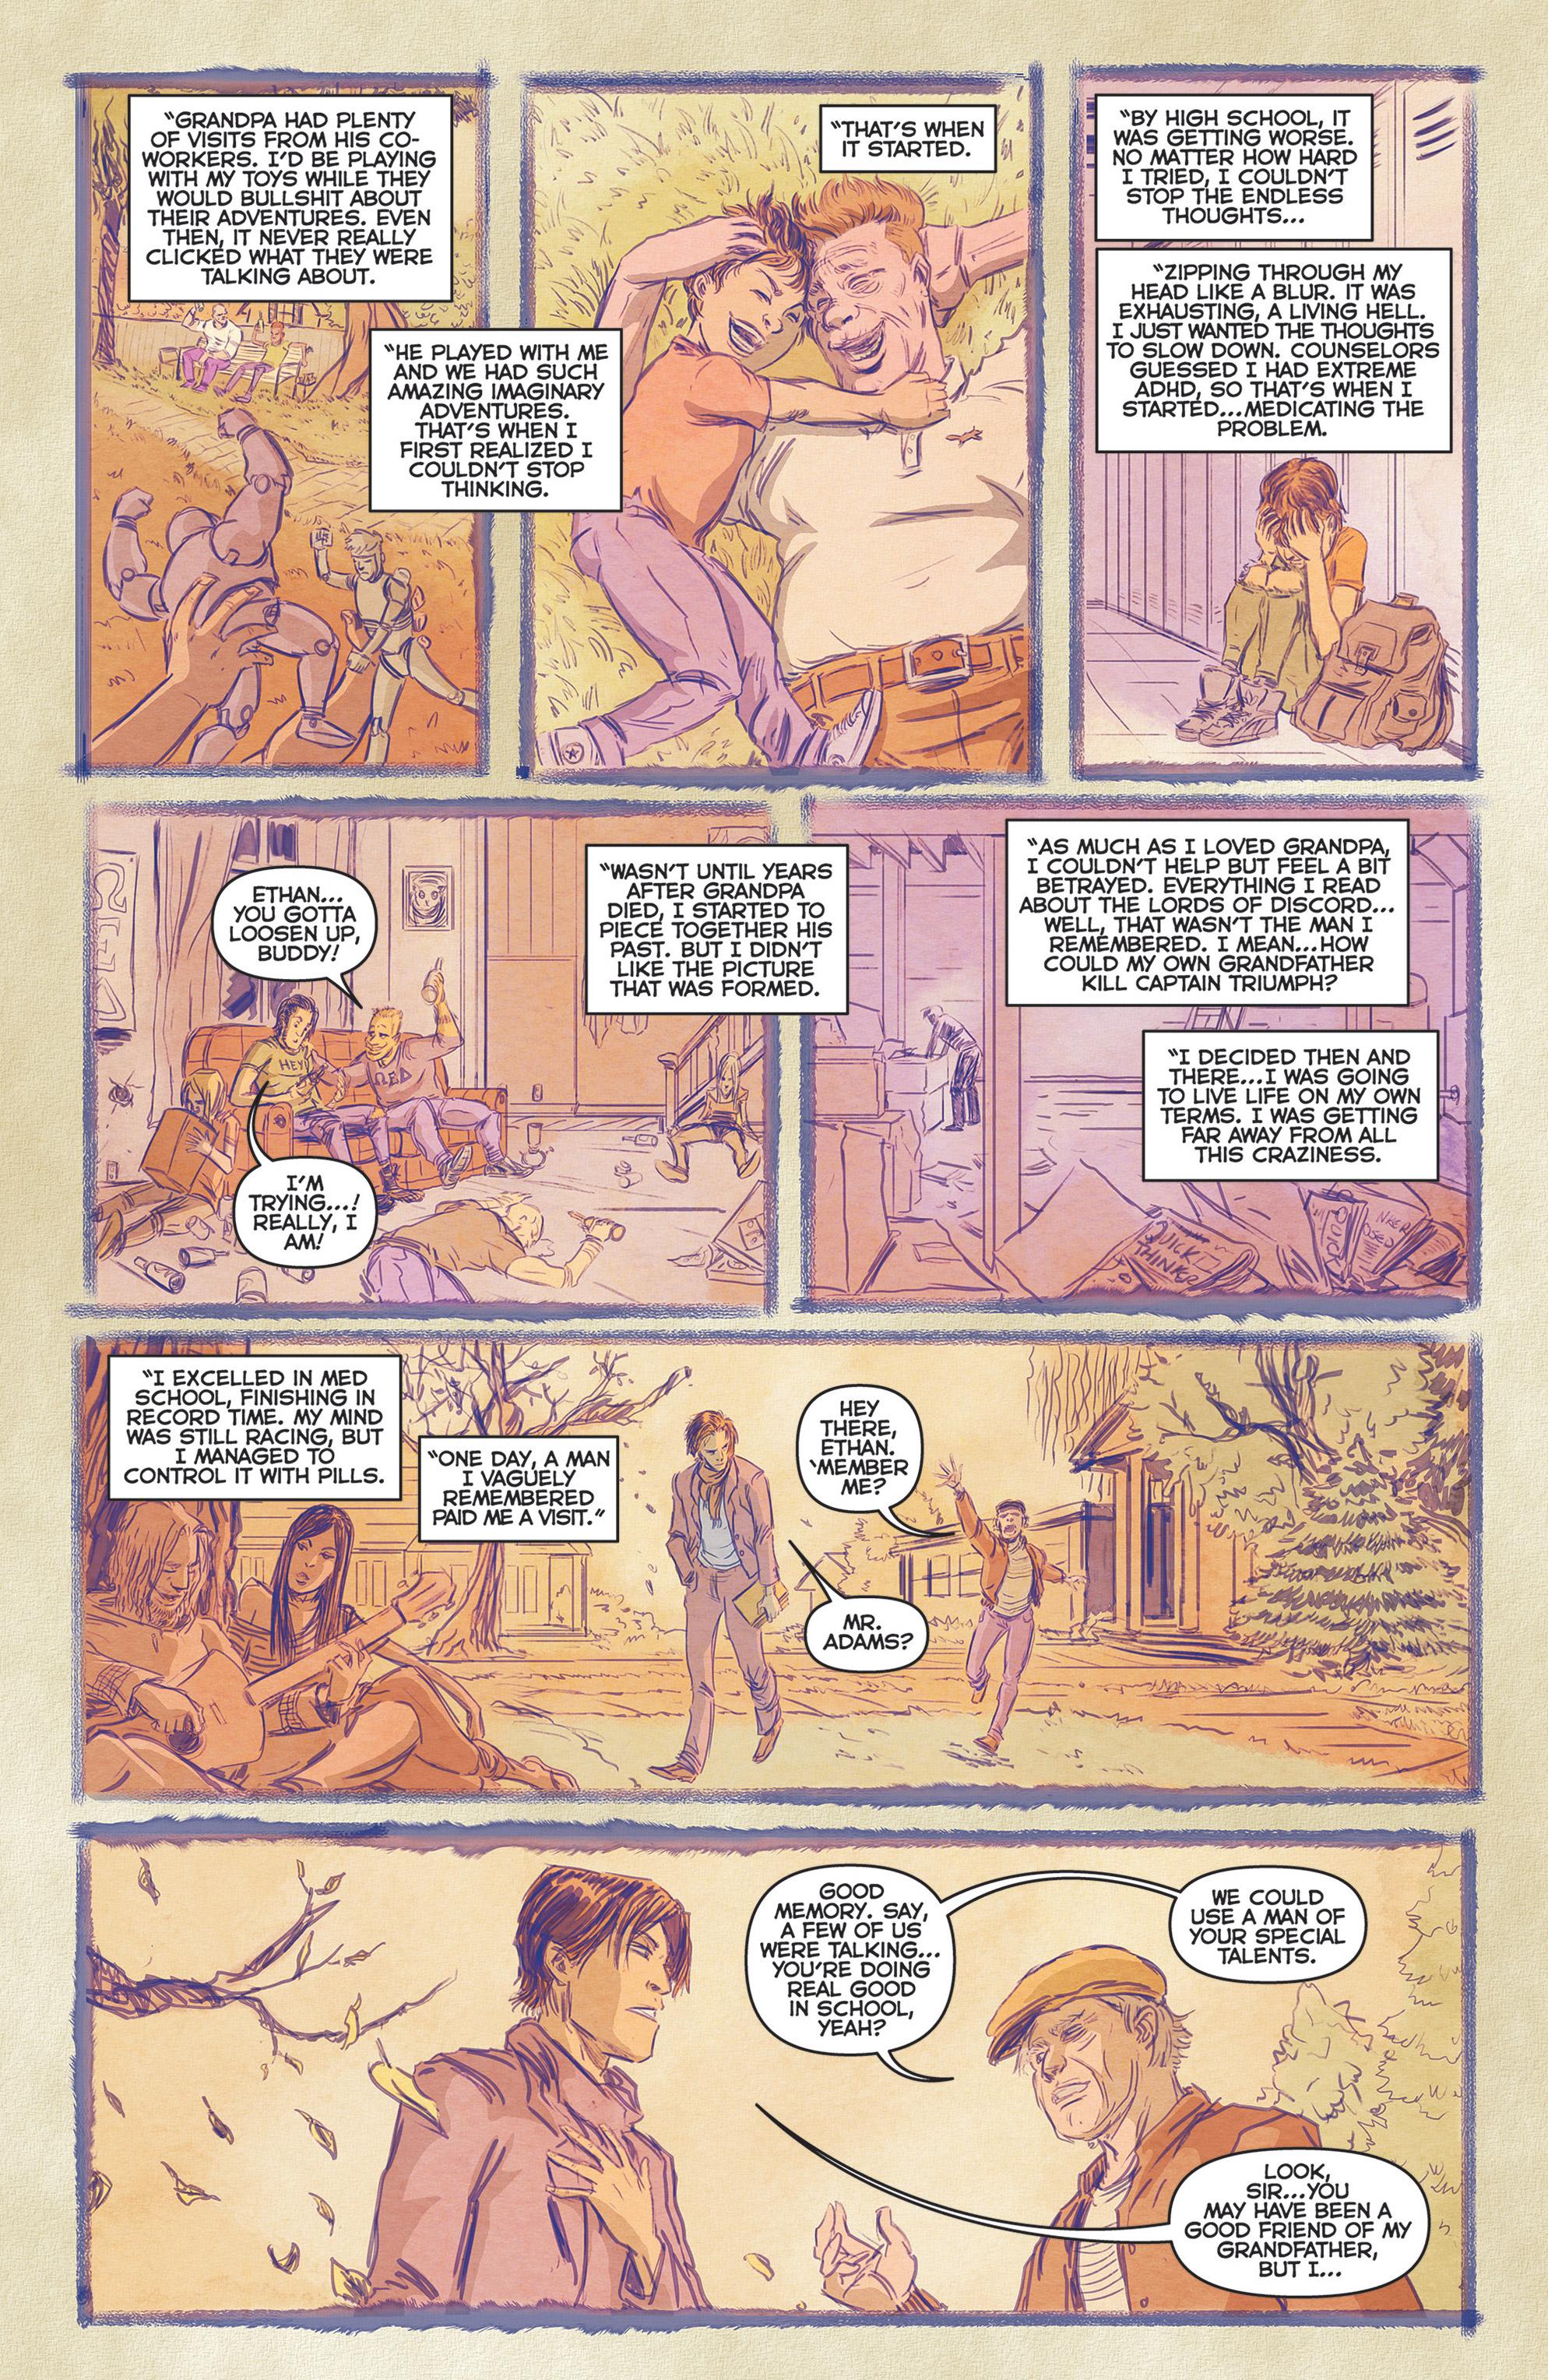 Read online Medisin comic -  Issue #1 - 18